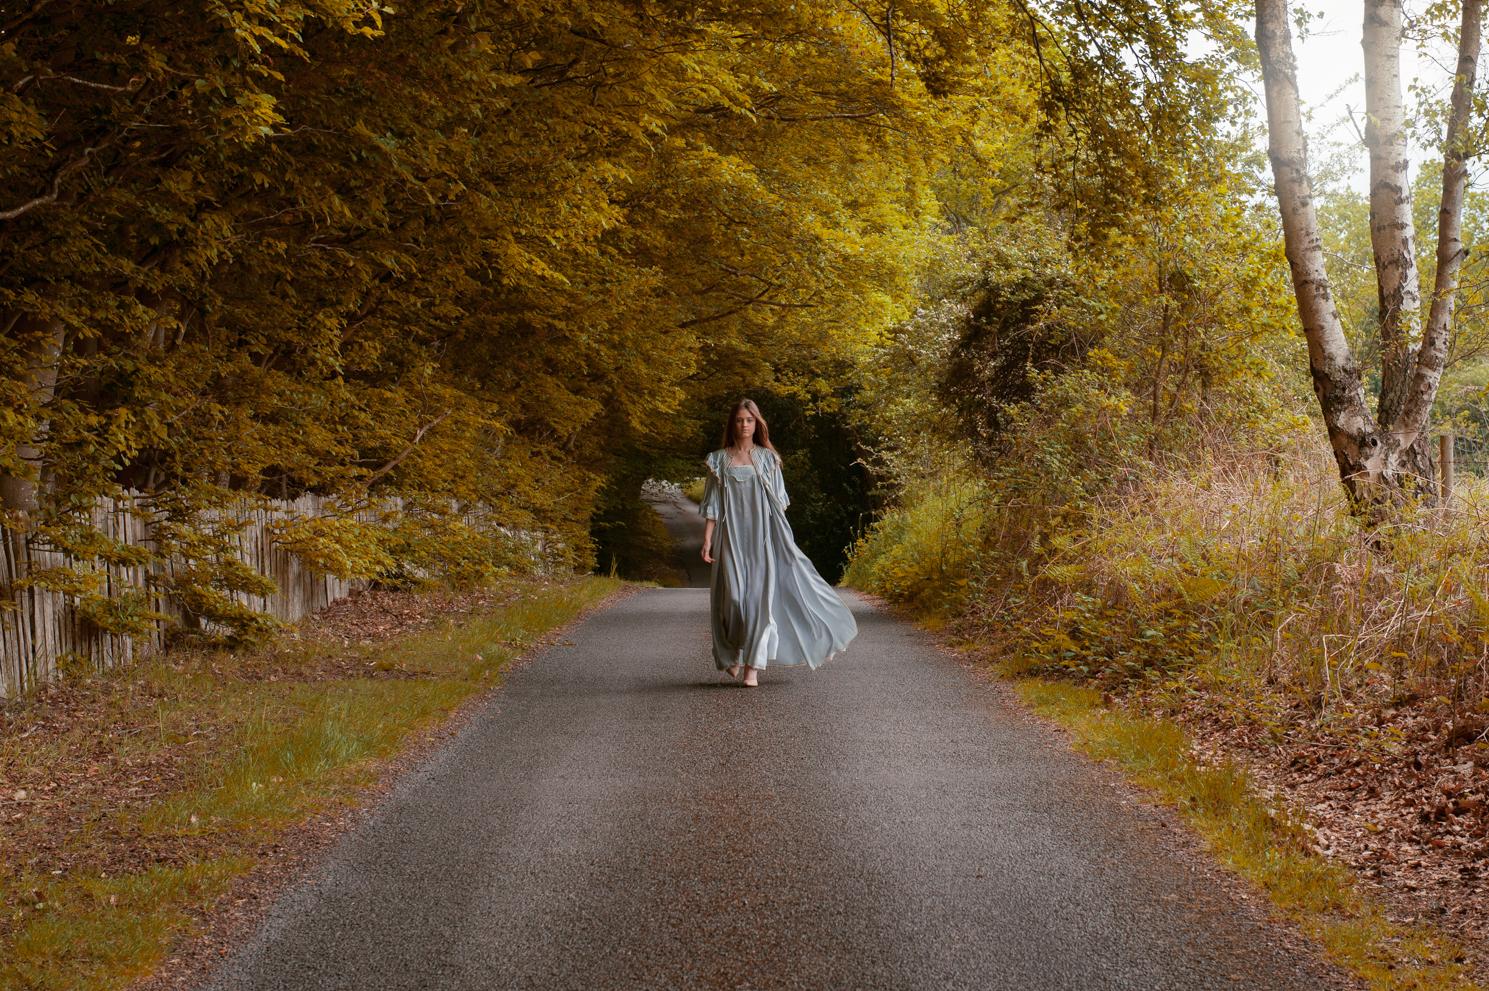 Autumn days. Fashion portrait by Farnham, Surrey based photographer James Muller